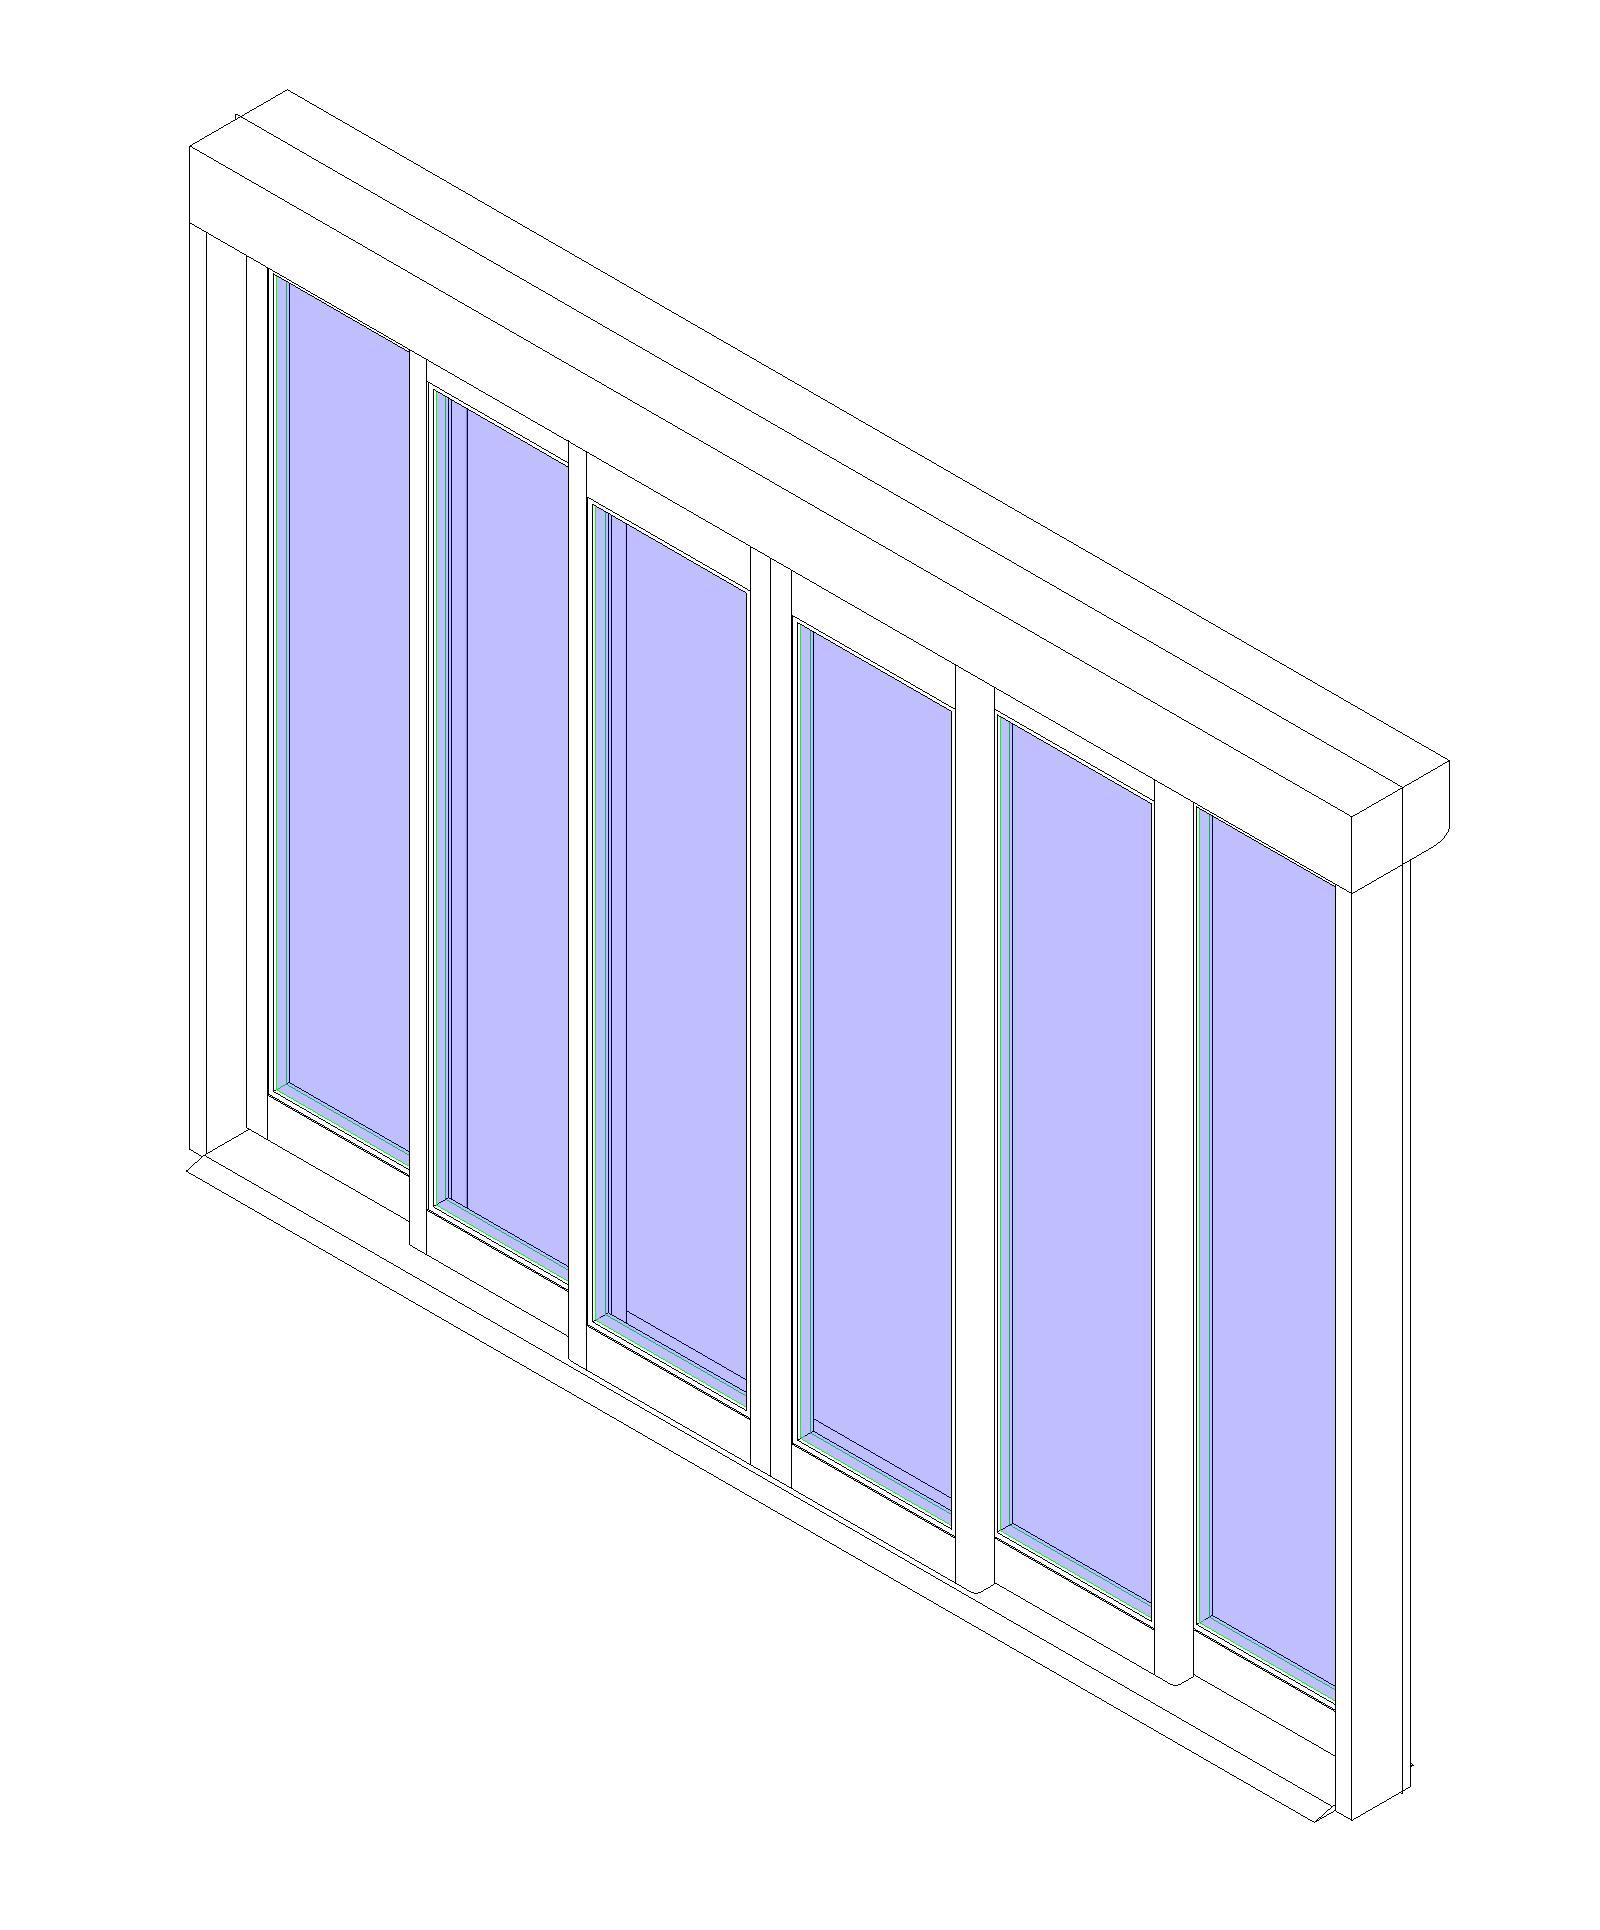 Glass folding door revit window family corner window revit sliding - Bim Objects Families